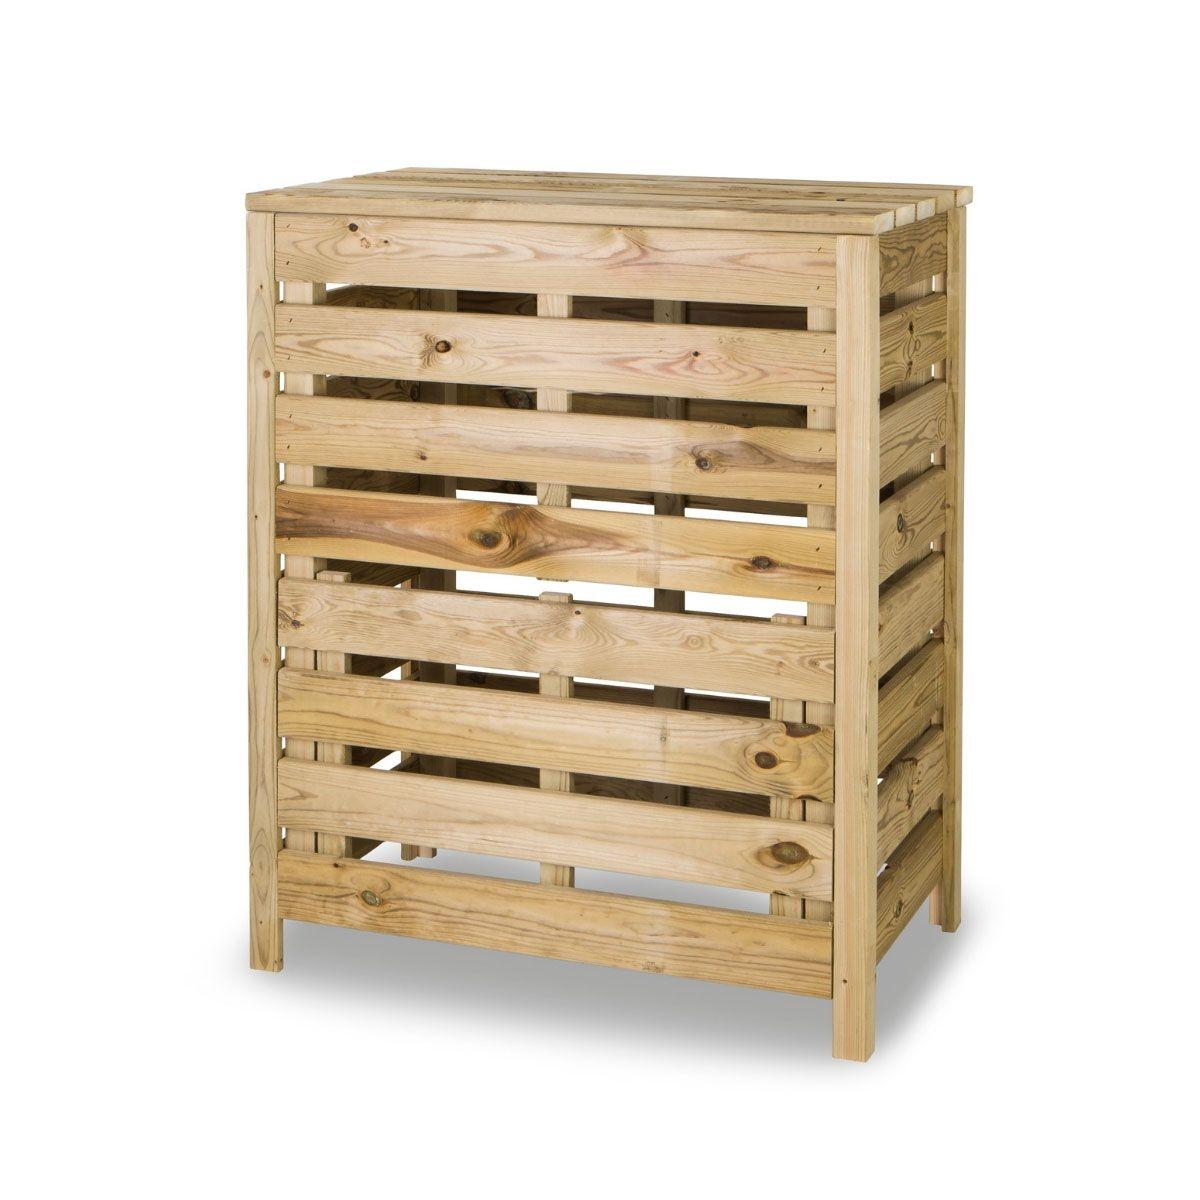 Compostadora ecológica para hacer compost casero